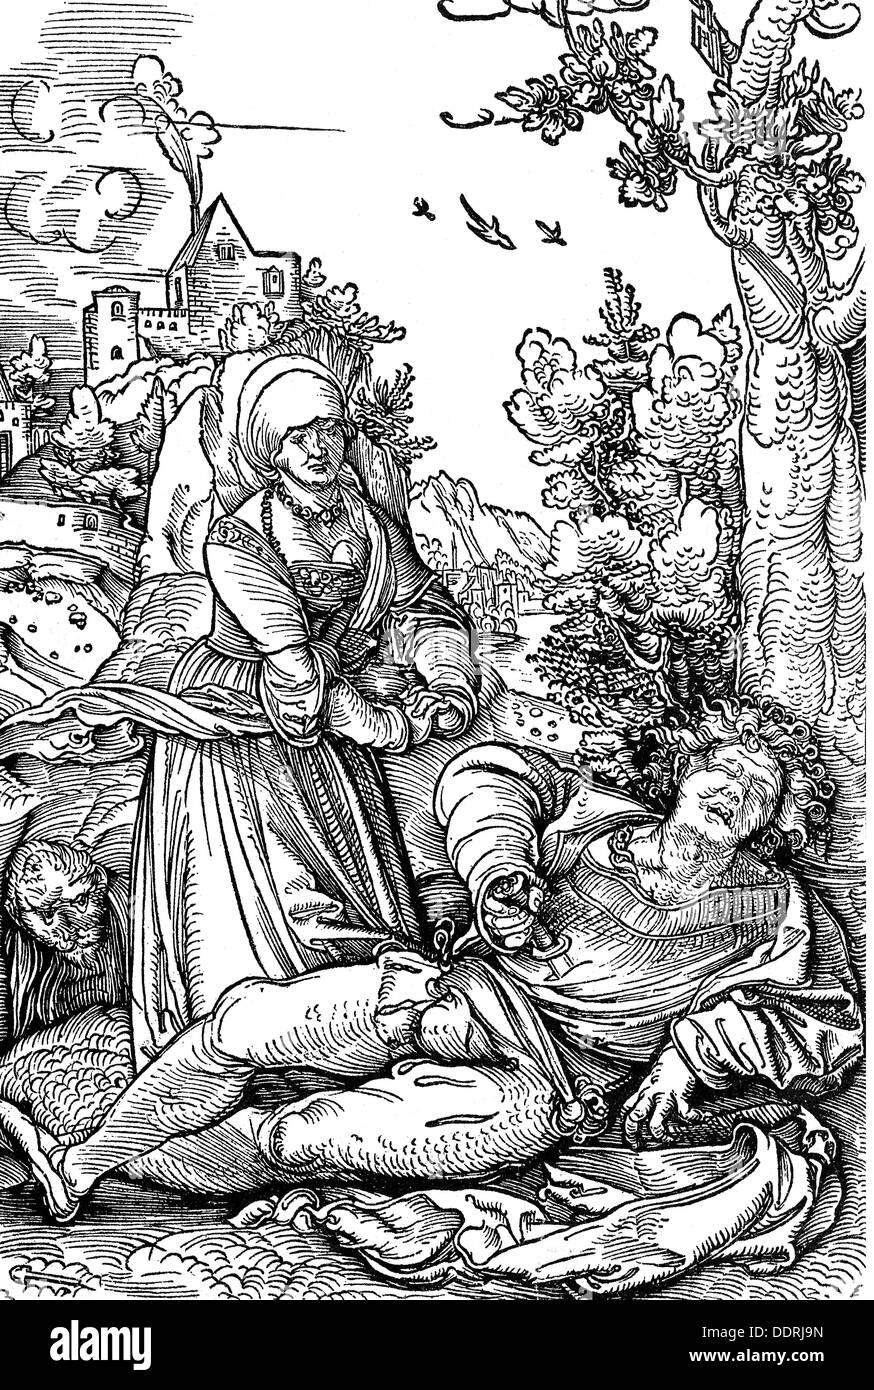 literature Greek mythology Pyramus and Thisbe from: Publius Ovidius Naso (43 BC - 17 AD) 'Metamorphoses' - Stock Image